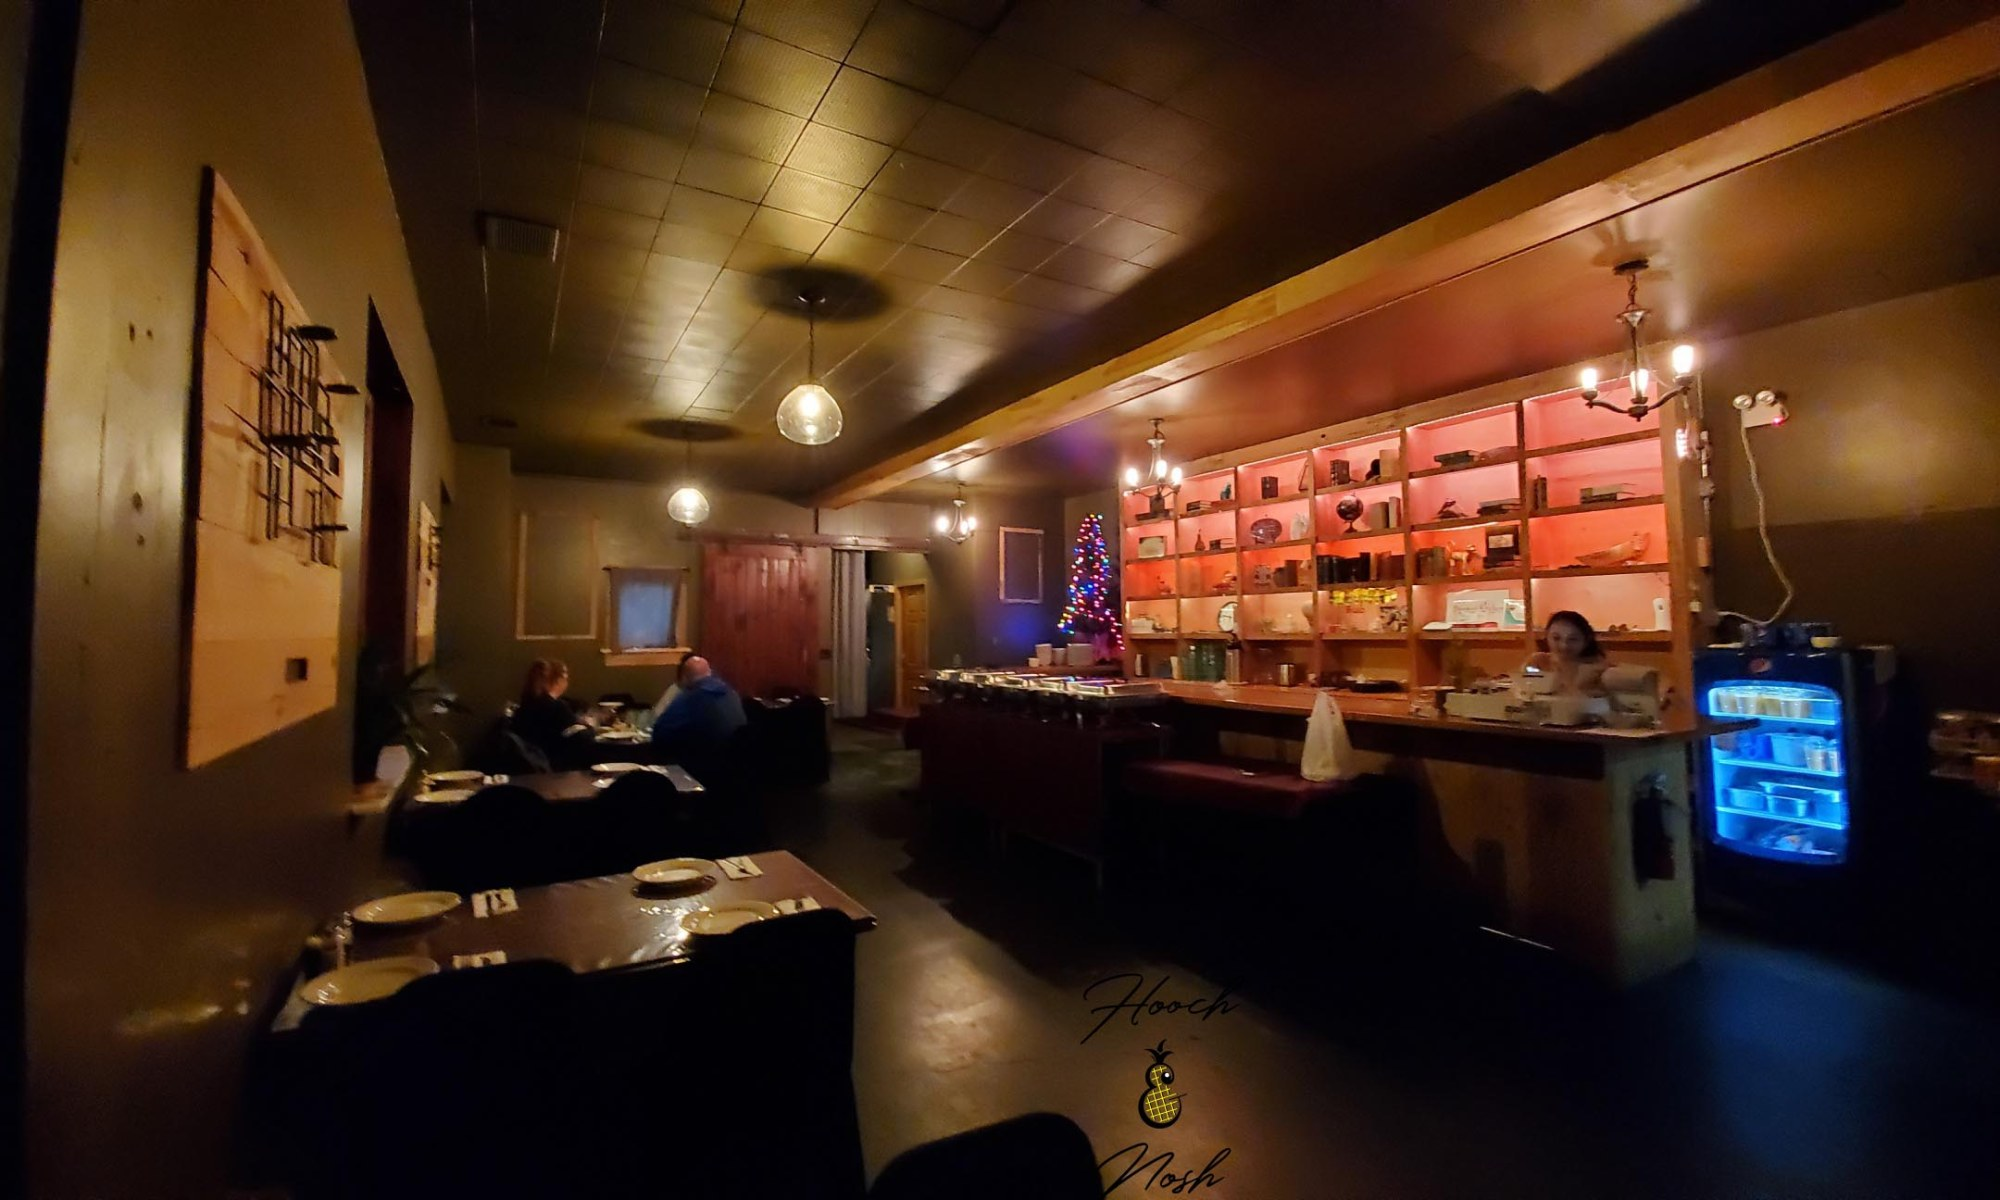 restaurant, kosciusko, warsaw, indiana, food